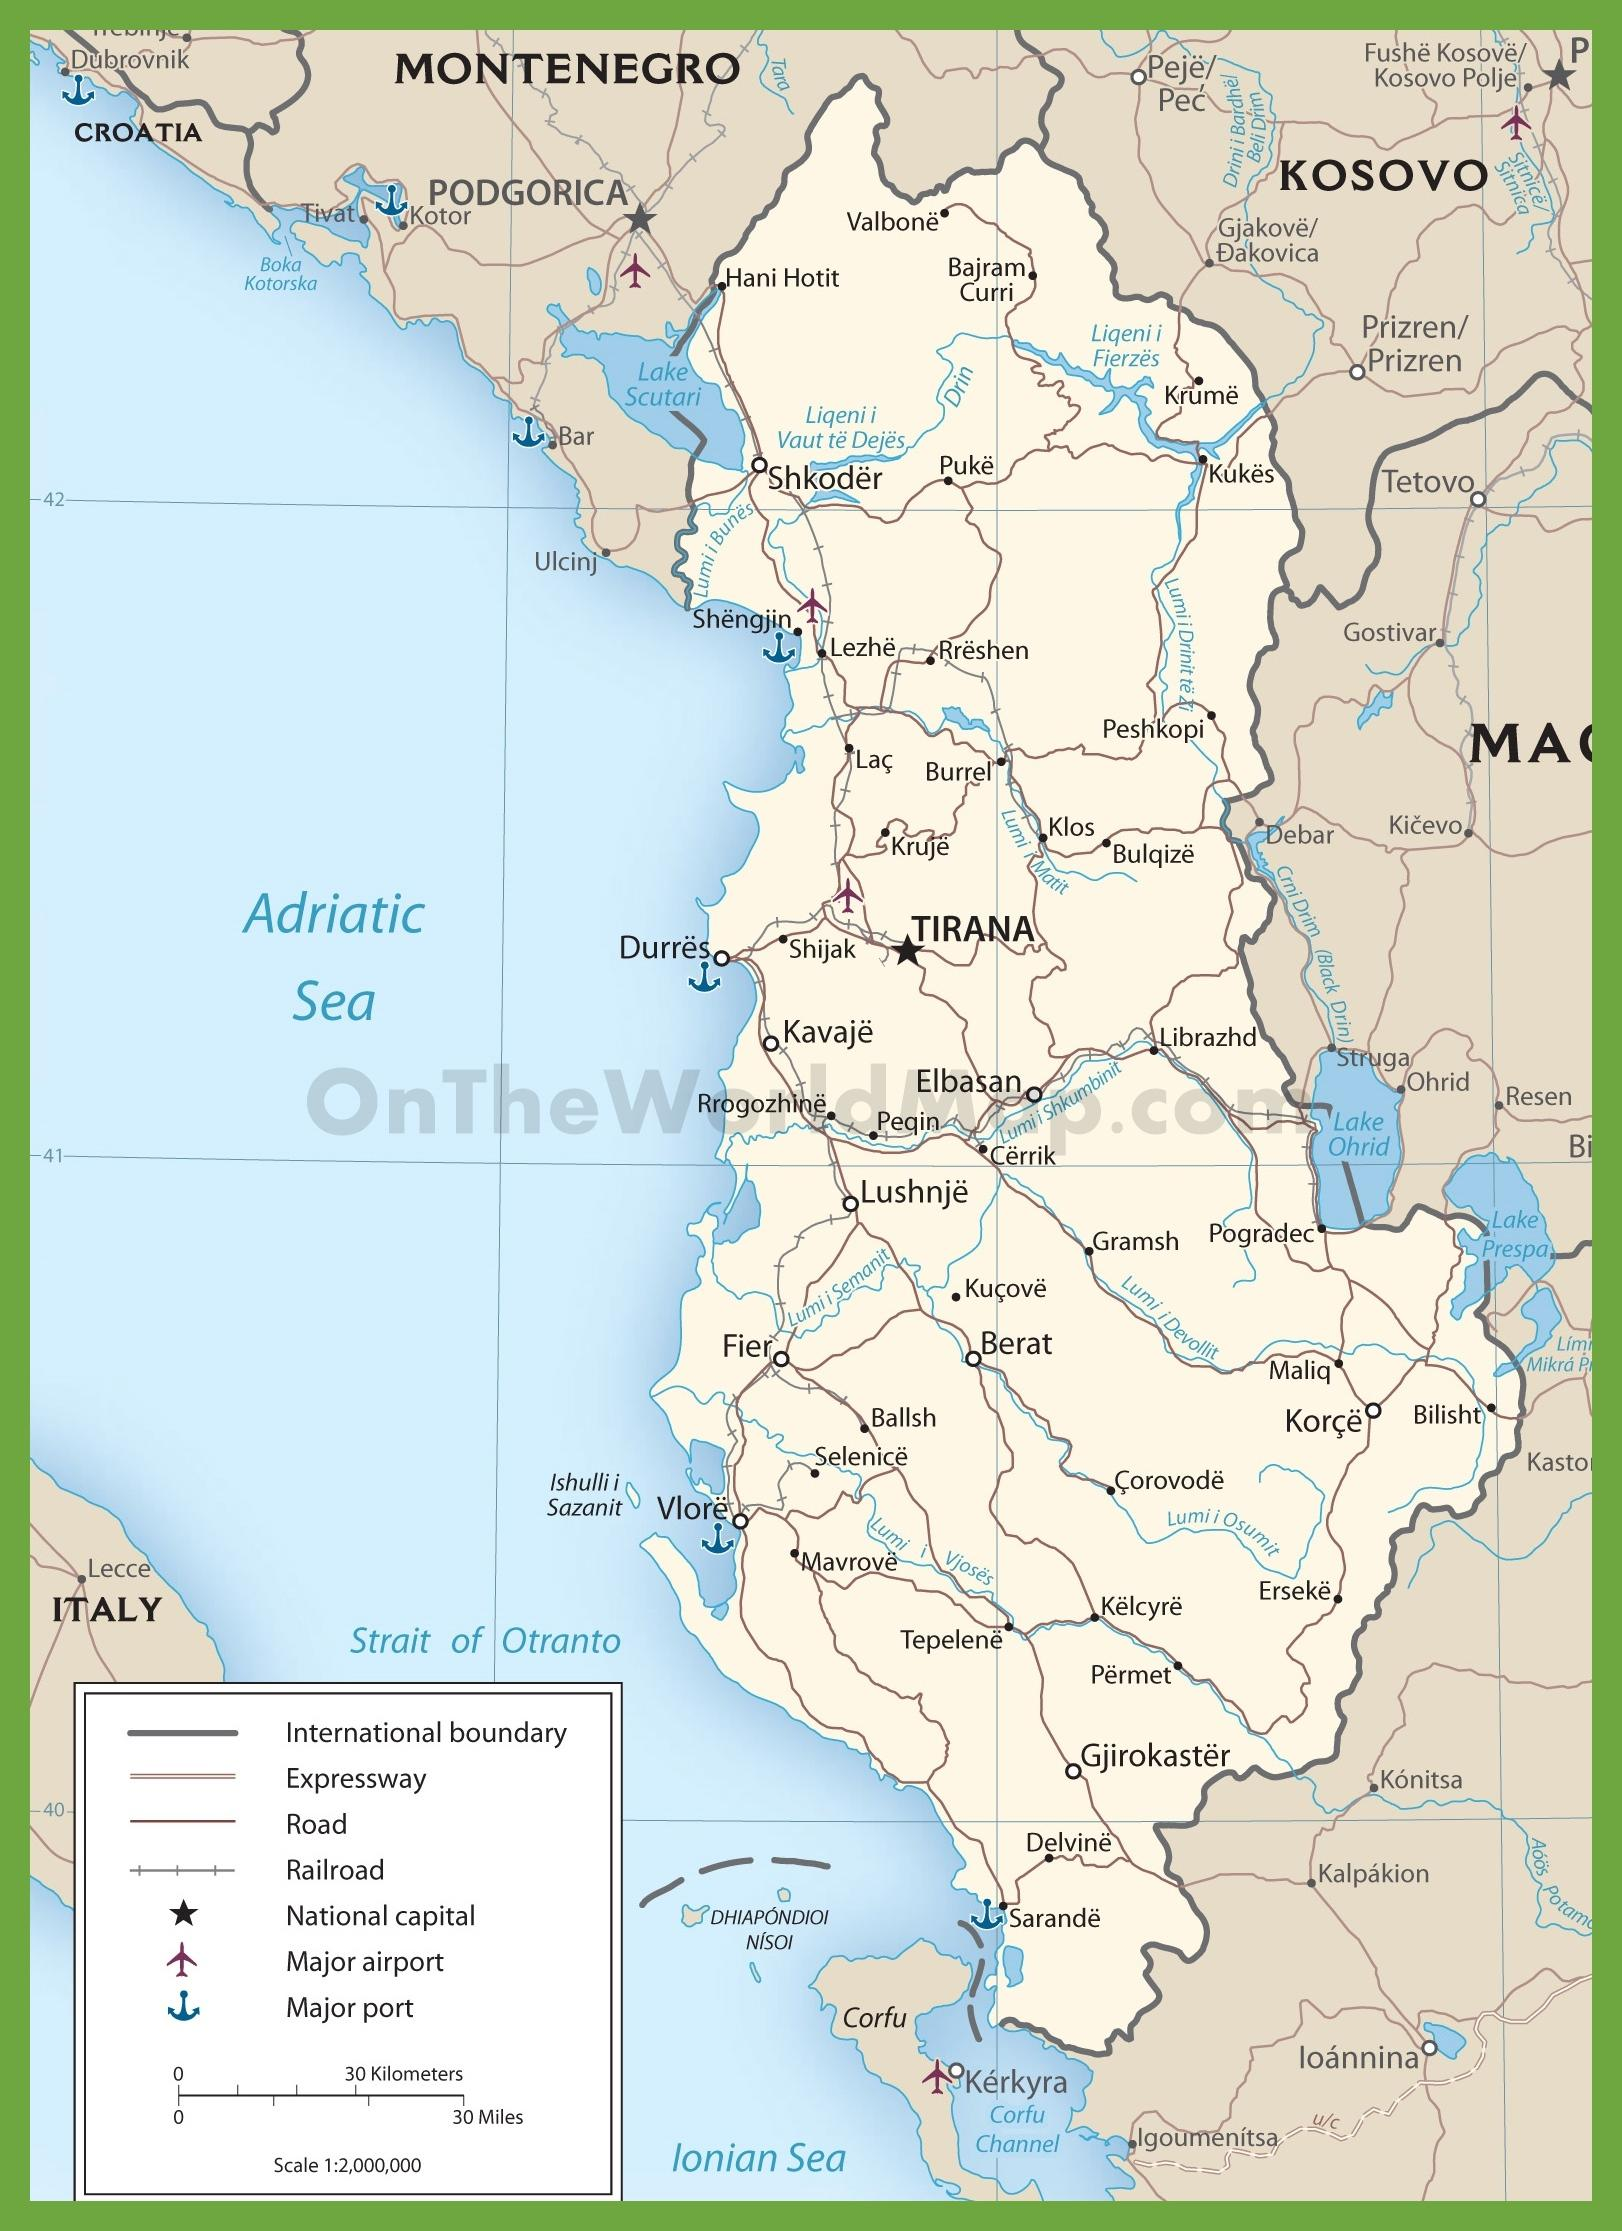 Karte Albanien.Albanien Straßenkarte Albanien Straßen Karte Europa Süd Europa